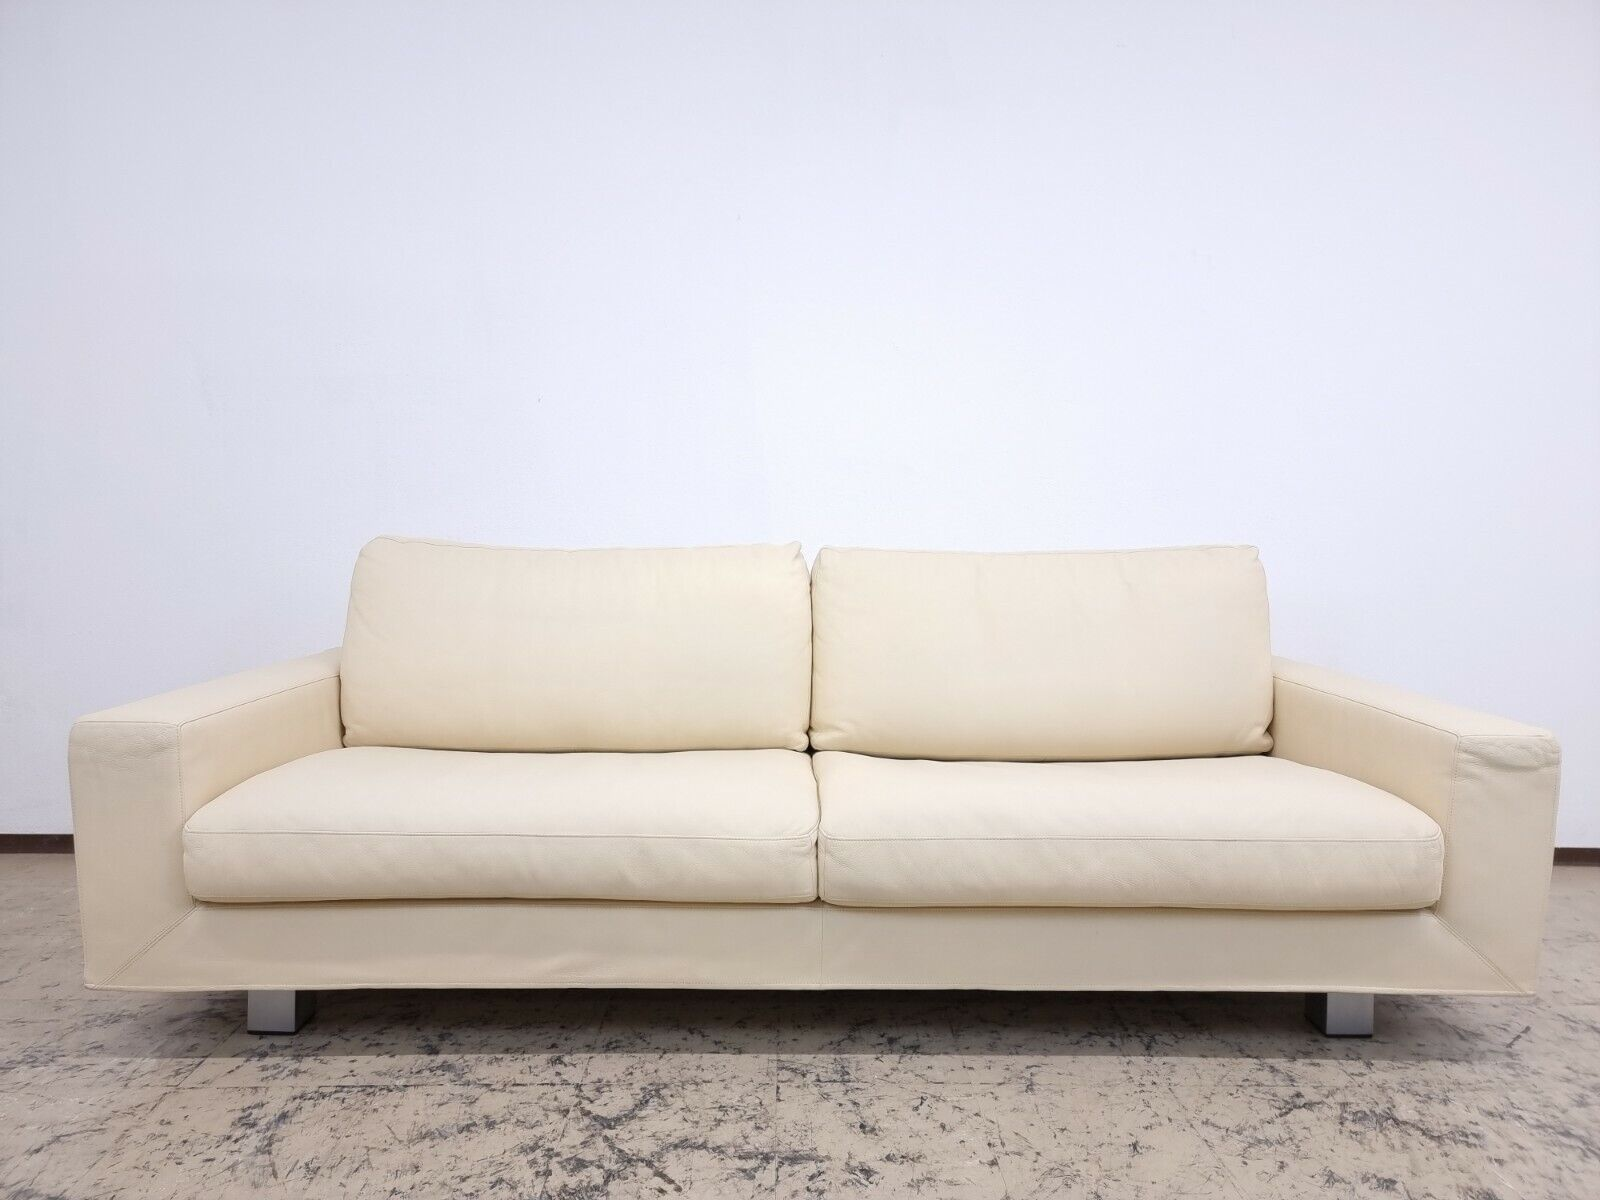 Fsm sofá sentar, diseñador sofá, de den Sitz der, sofá de cuero